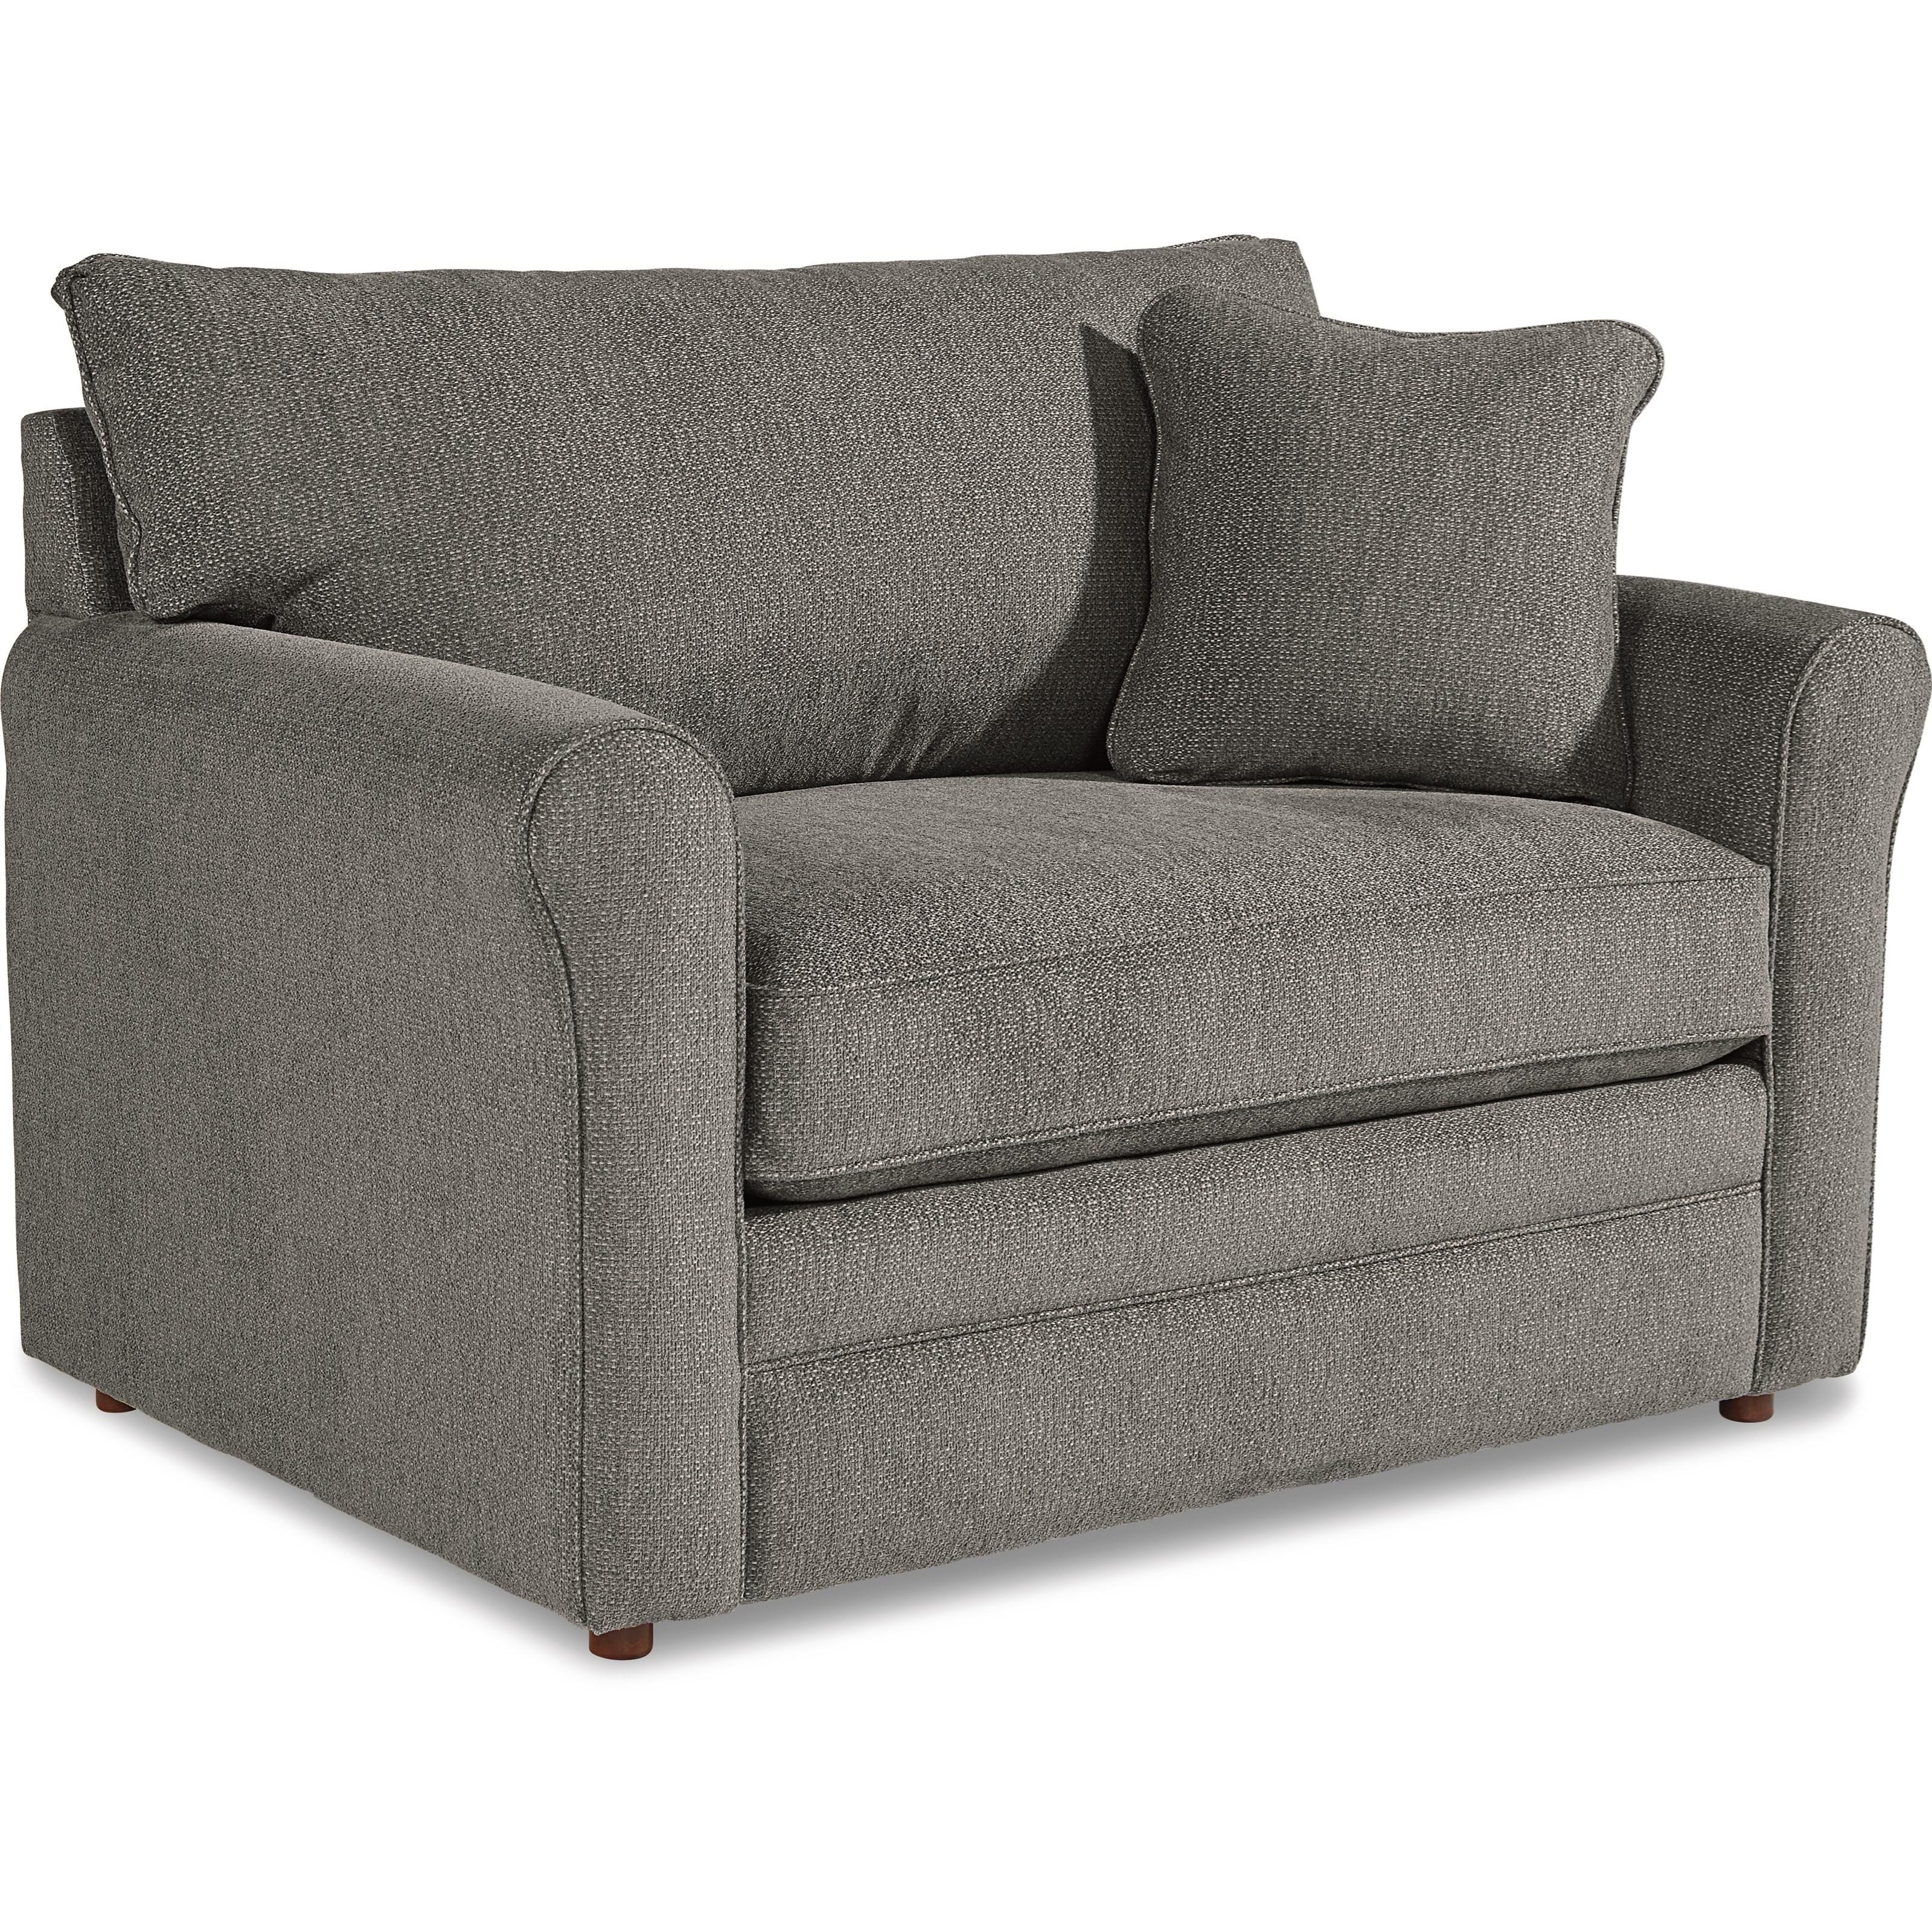 Picture of: La Z Boy Leah Supreme Comfort Twin Sleeper Conlin S Furniture Sleeper Sofas